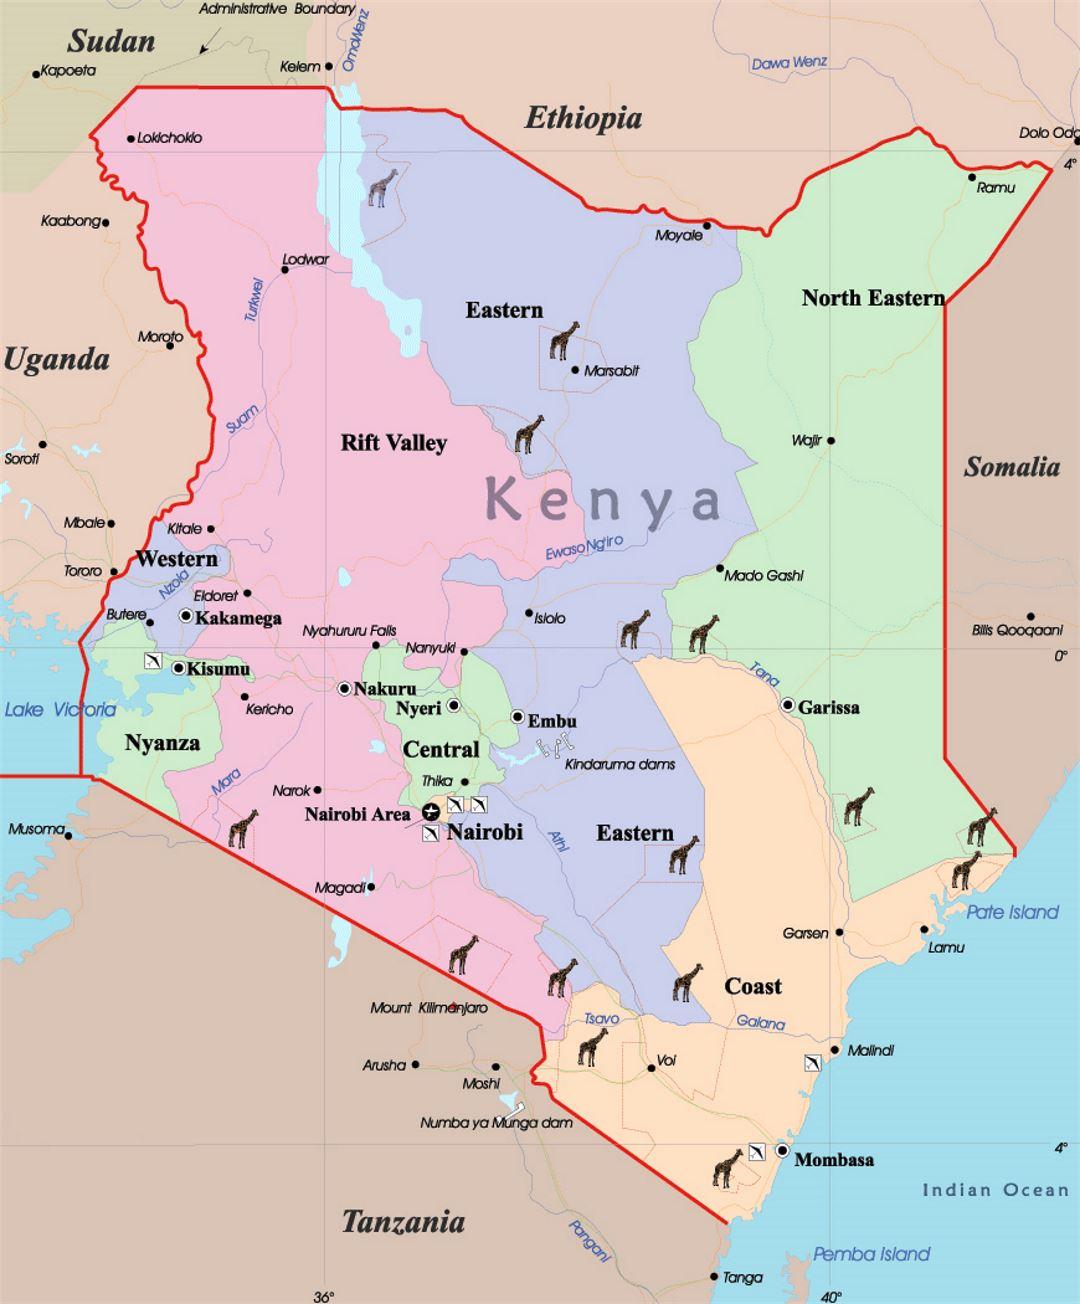 Detailed Map Of Kenya Kenya Africa Mapsland Maps Of The World - Kenya map